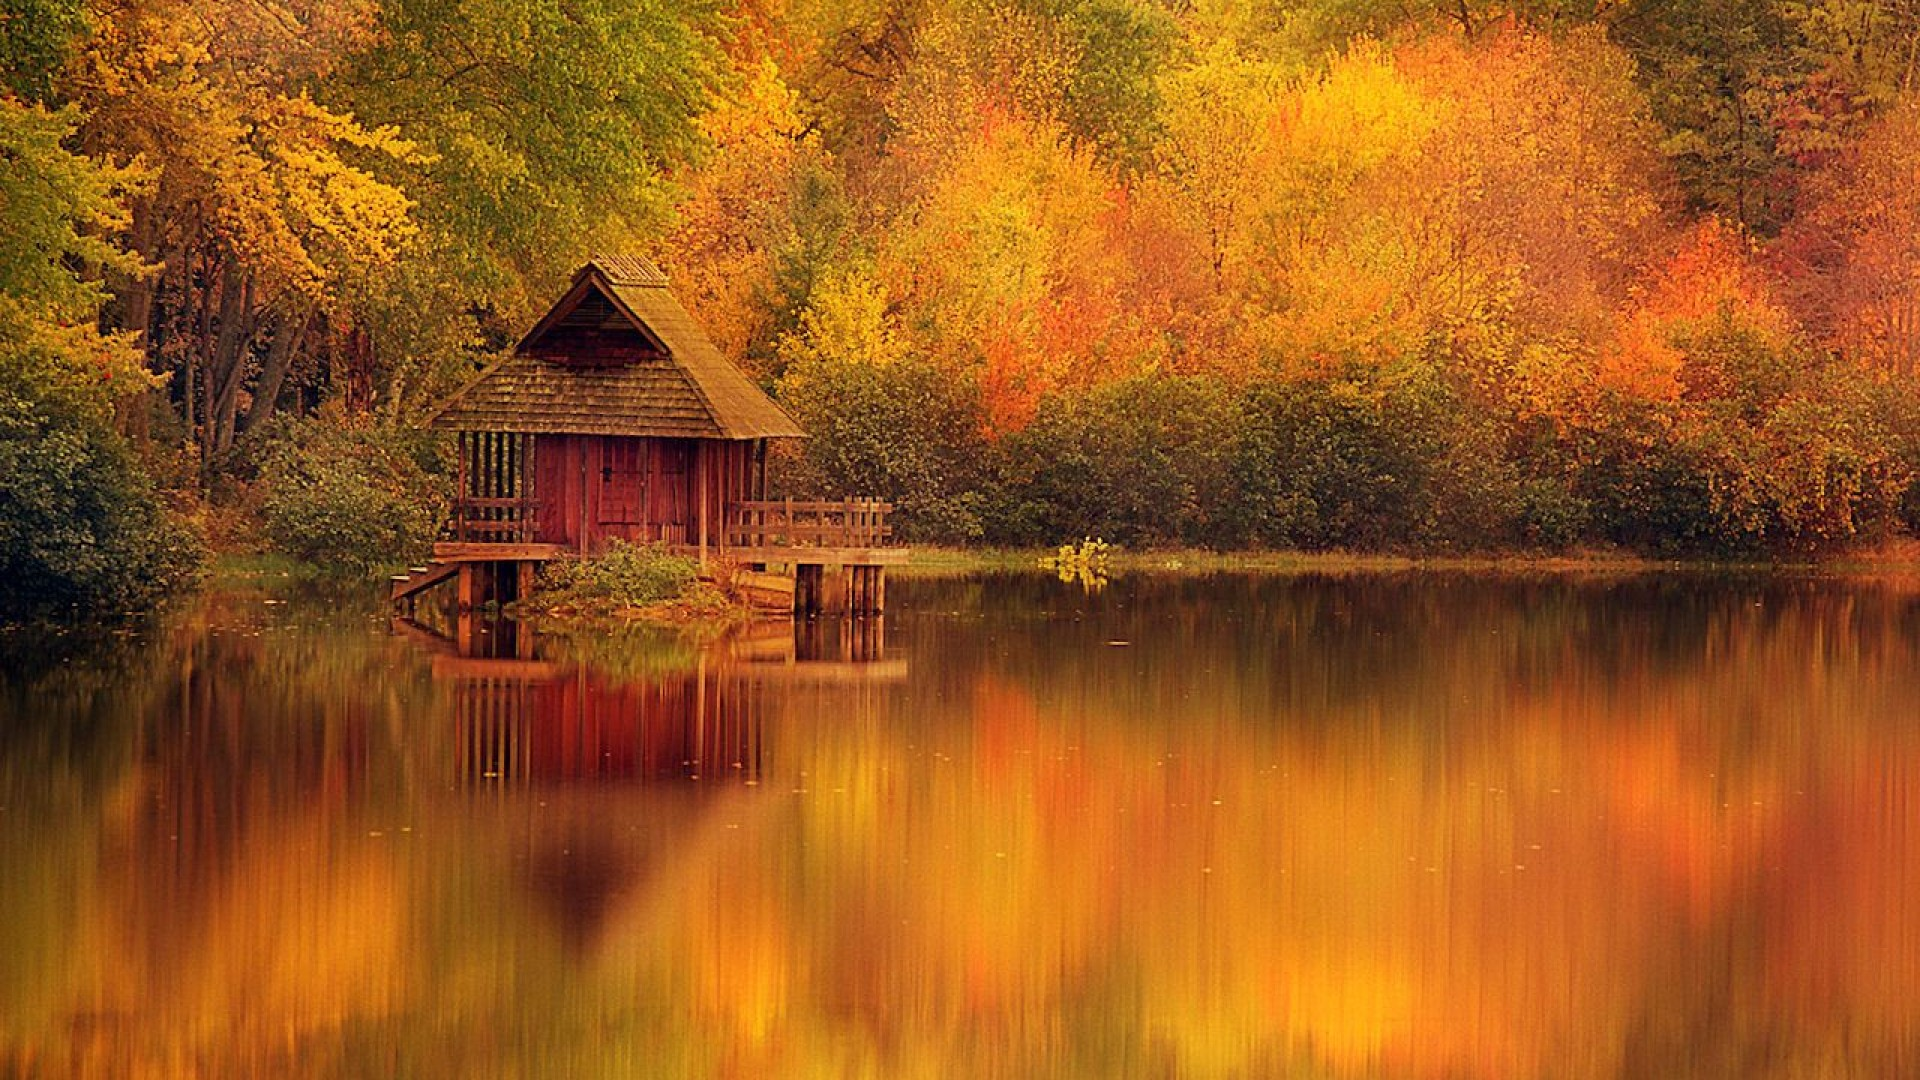 Fall Colors Mobile Wallpaper Hd Log Cabin Wallpapers Pixelstalk Net